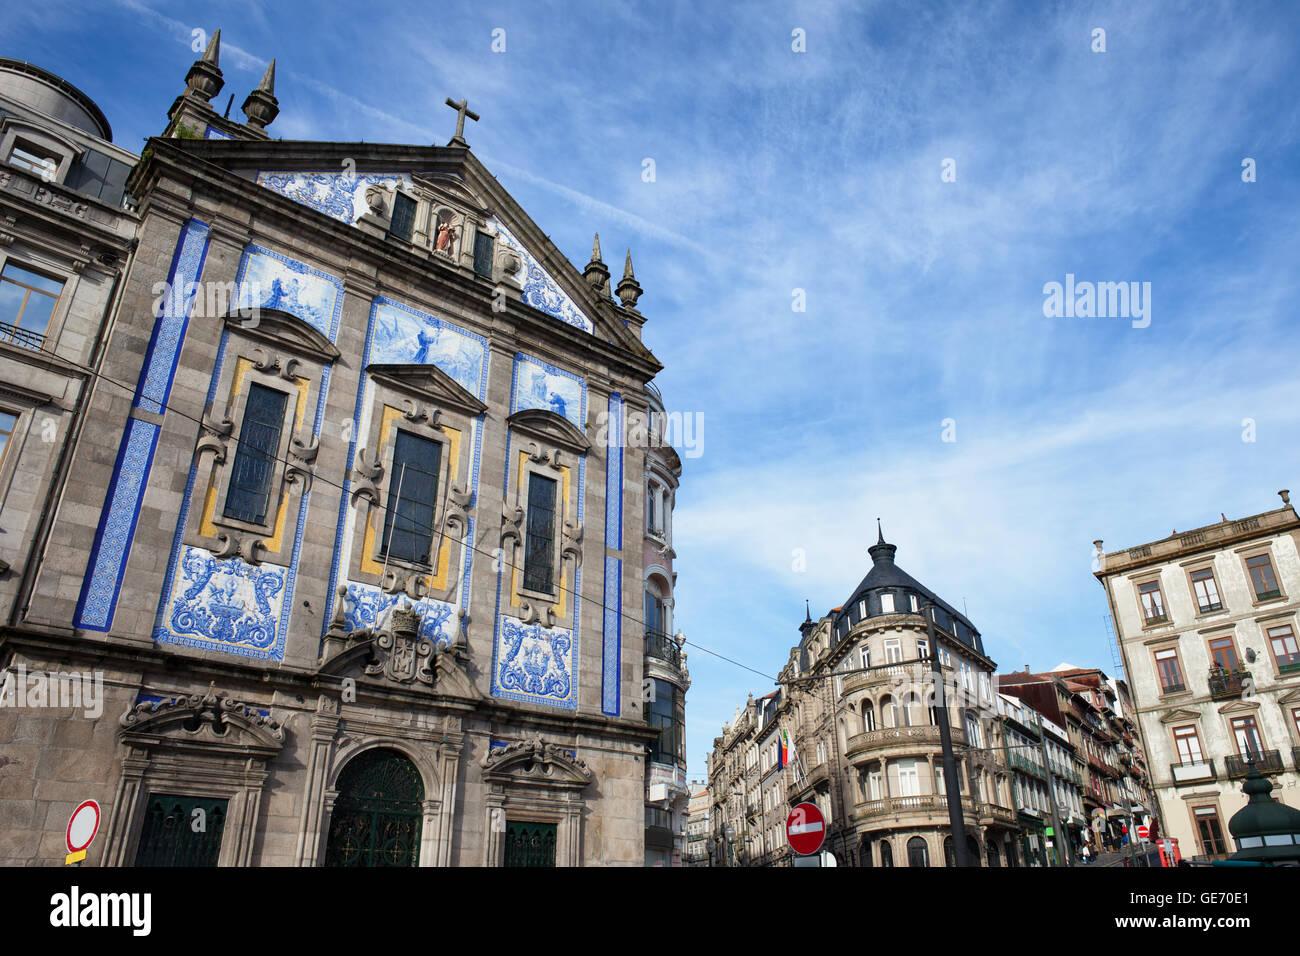 Portugal, Porto, Saint Anthony Church (Igreja de Santo Antonio) in city centre, Baroque facade - Stock Image